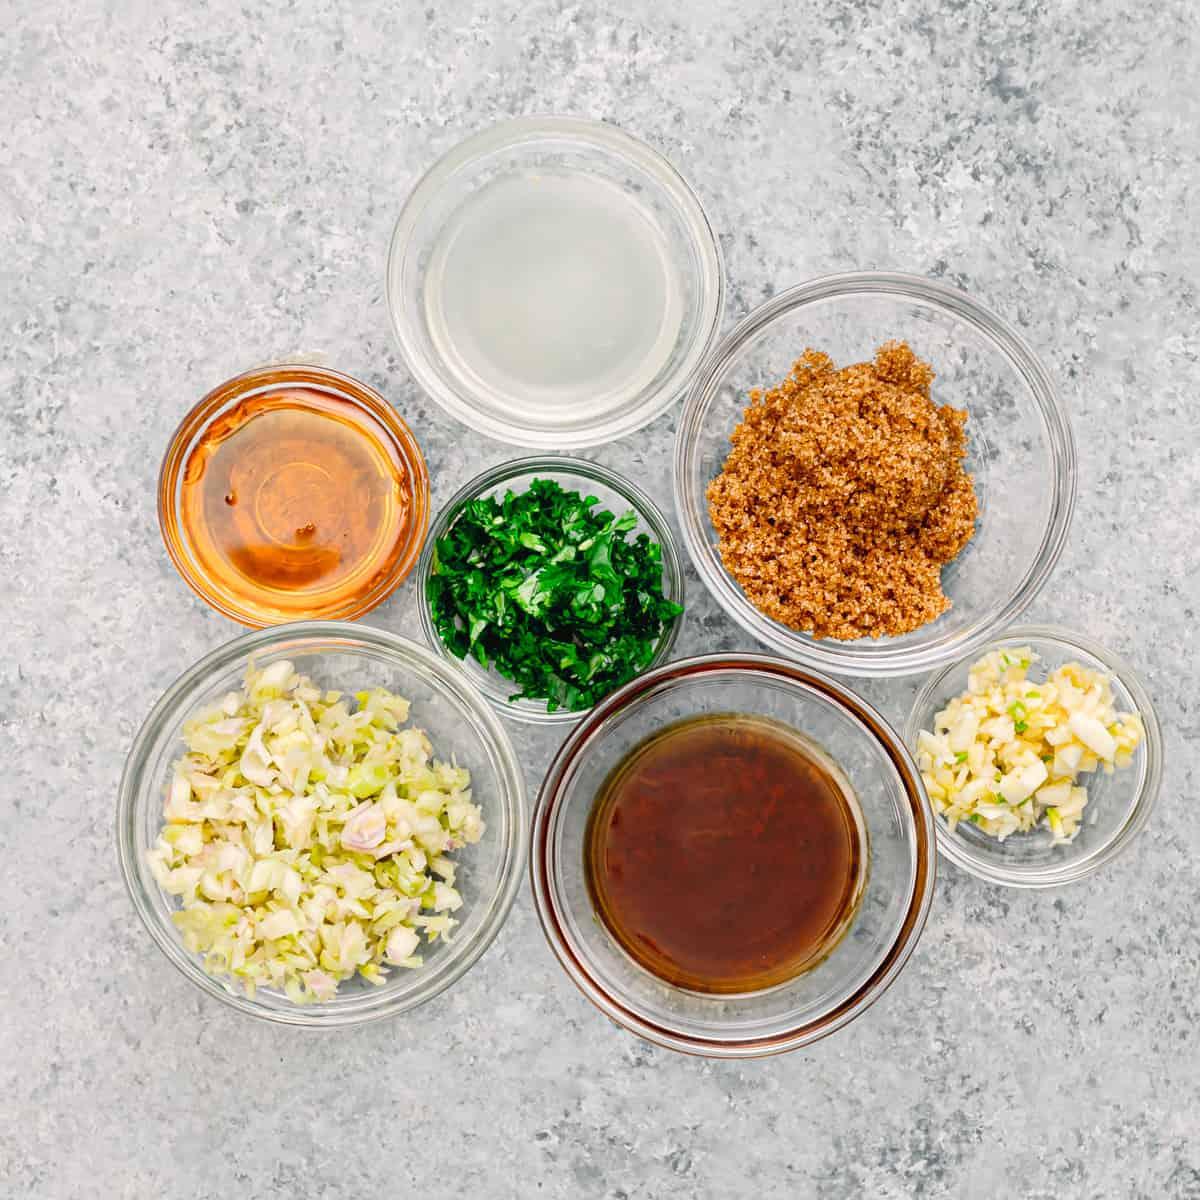 marinade sauce ingredients.